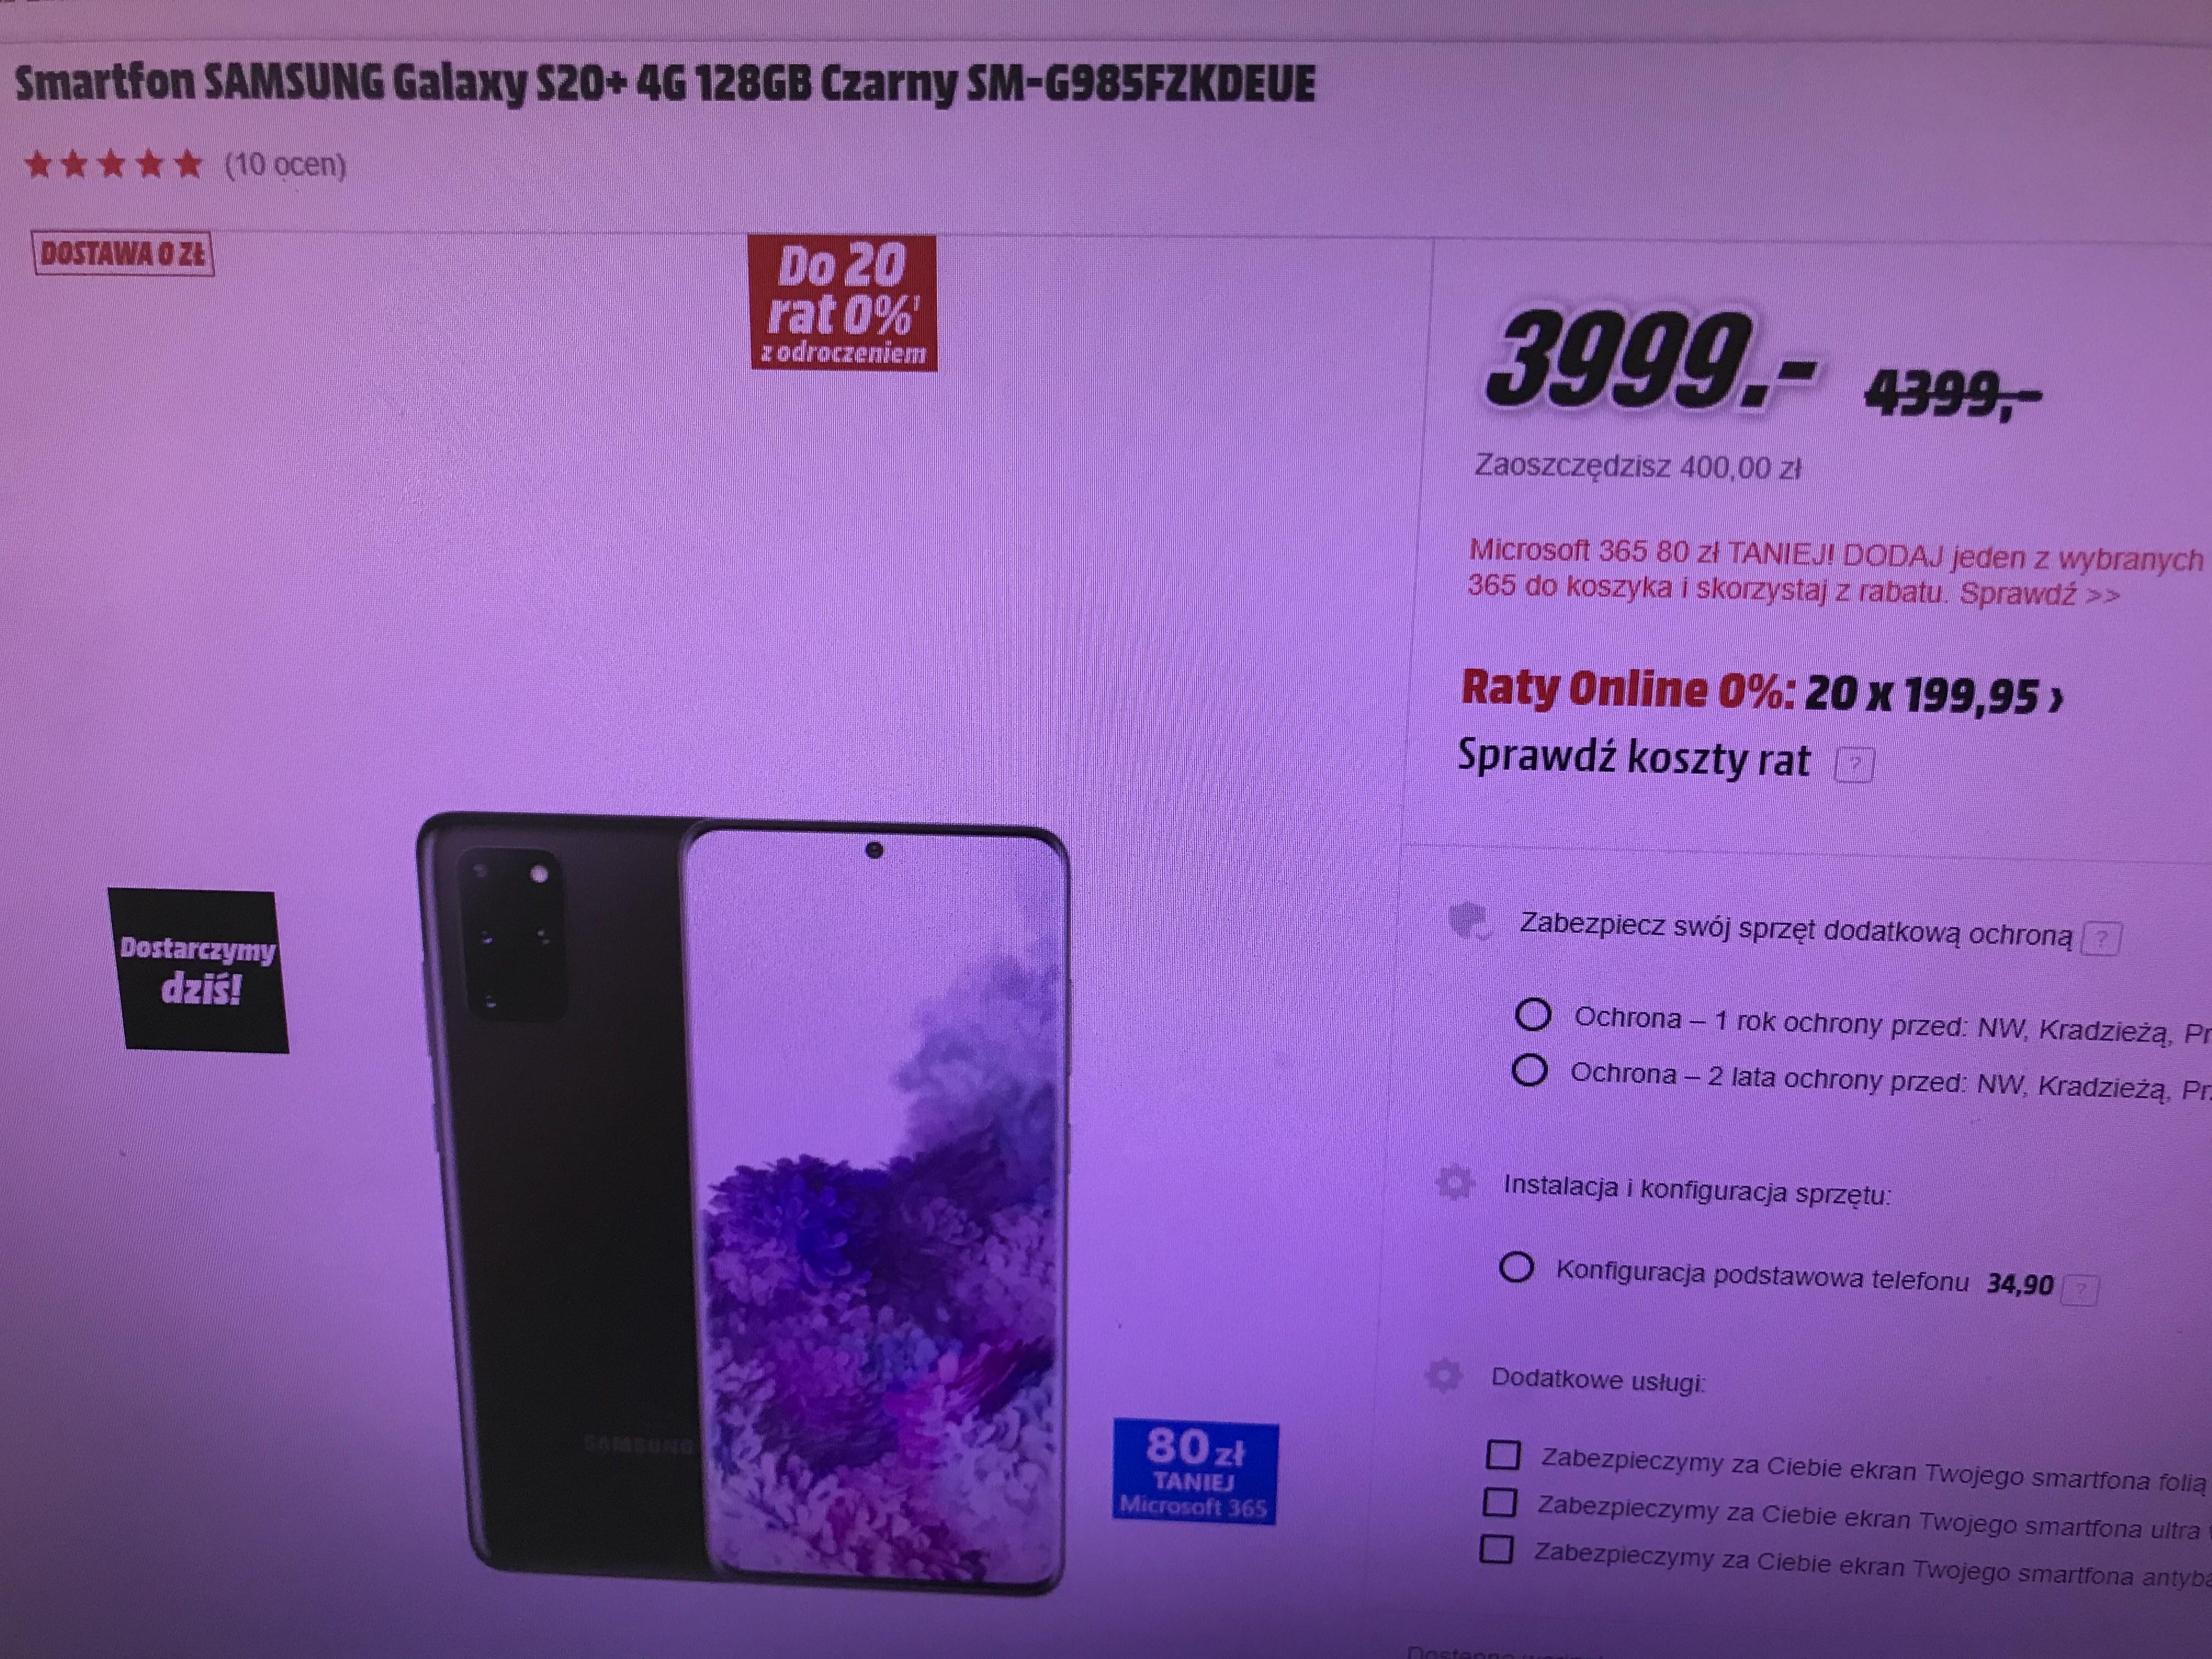 Samsung Galaxy S20+ za 3999 i Buds+ gratis